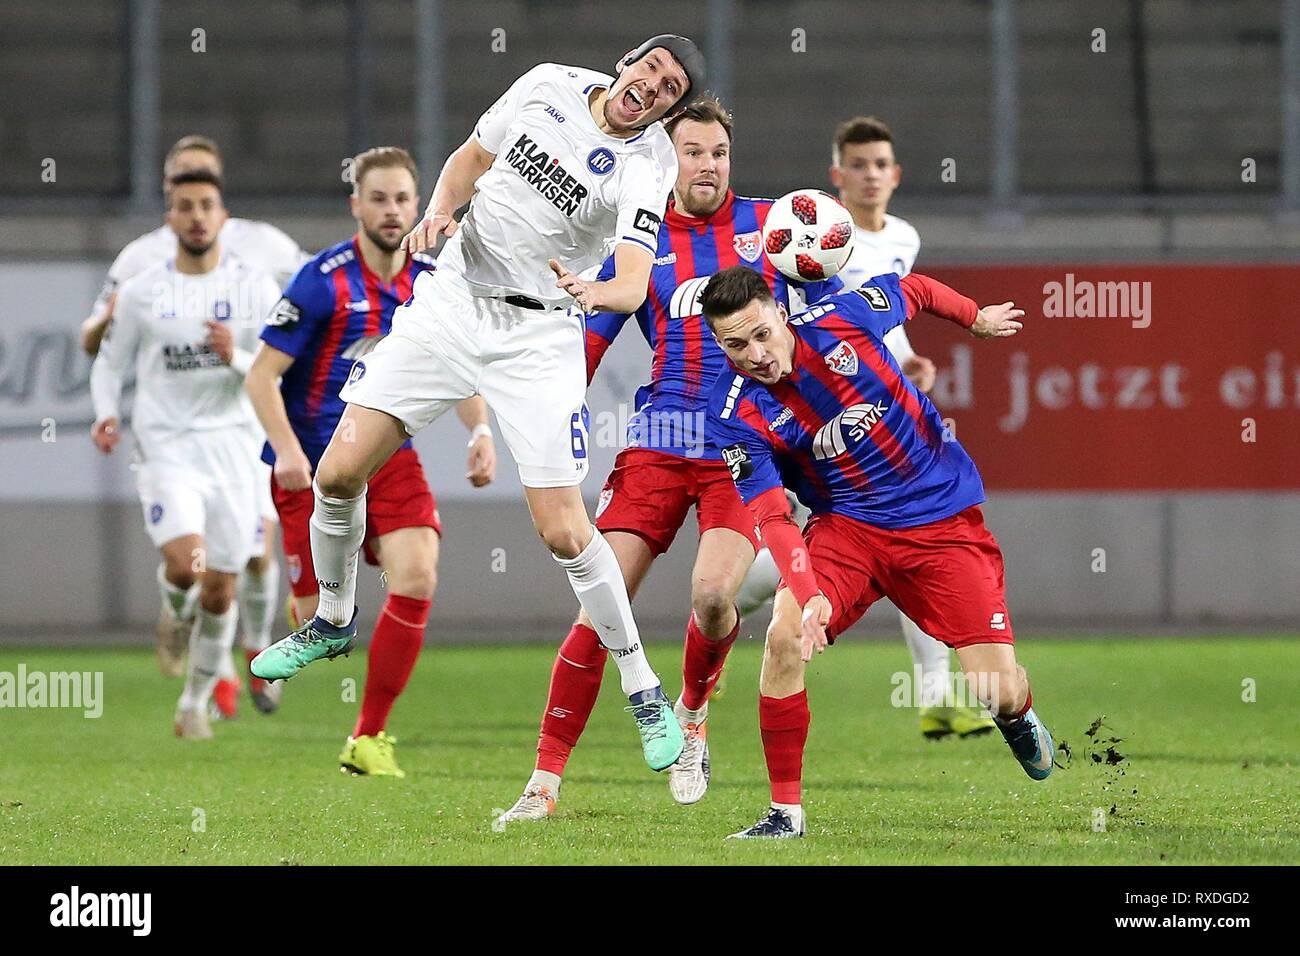 firo: 08.03.2019 Football, 3. Bundesliga, season 2018/2019 KFC Uerdingen 05 - Karlsruher SC Maurice Litka (# 8, KFC Uerdingen 05) in duels with Damian Rovubach (# 6, Karlsruher SC) | usage worldwide - Stock Image